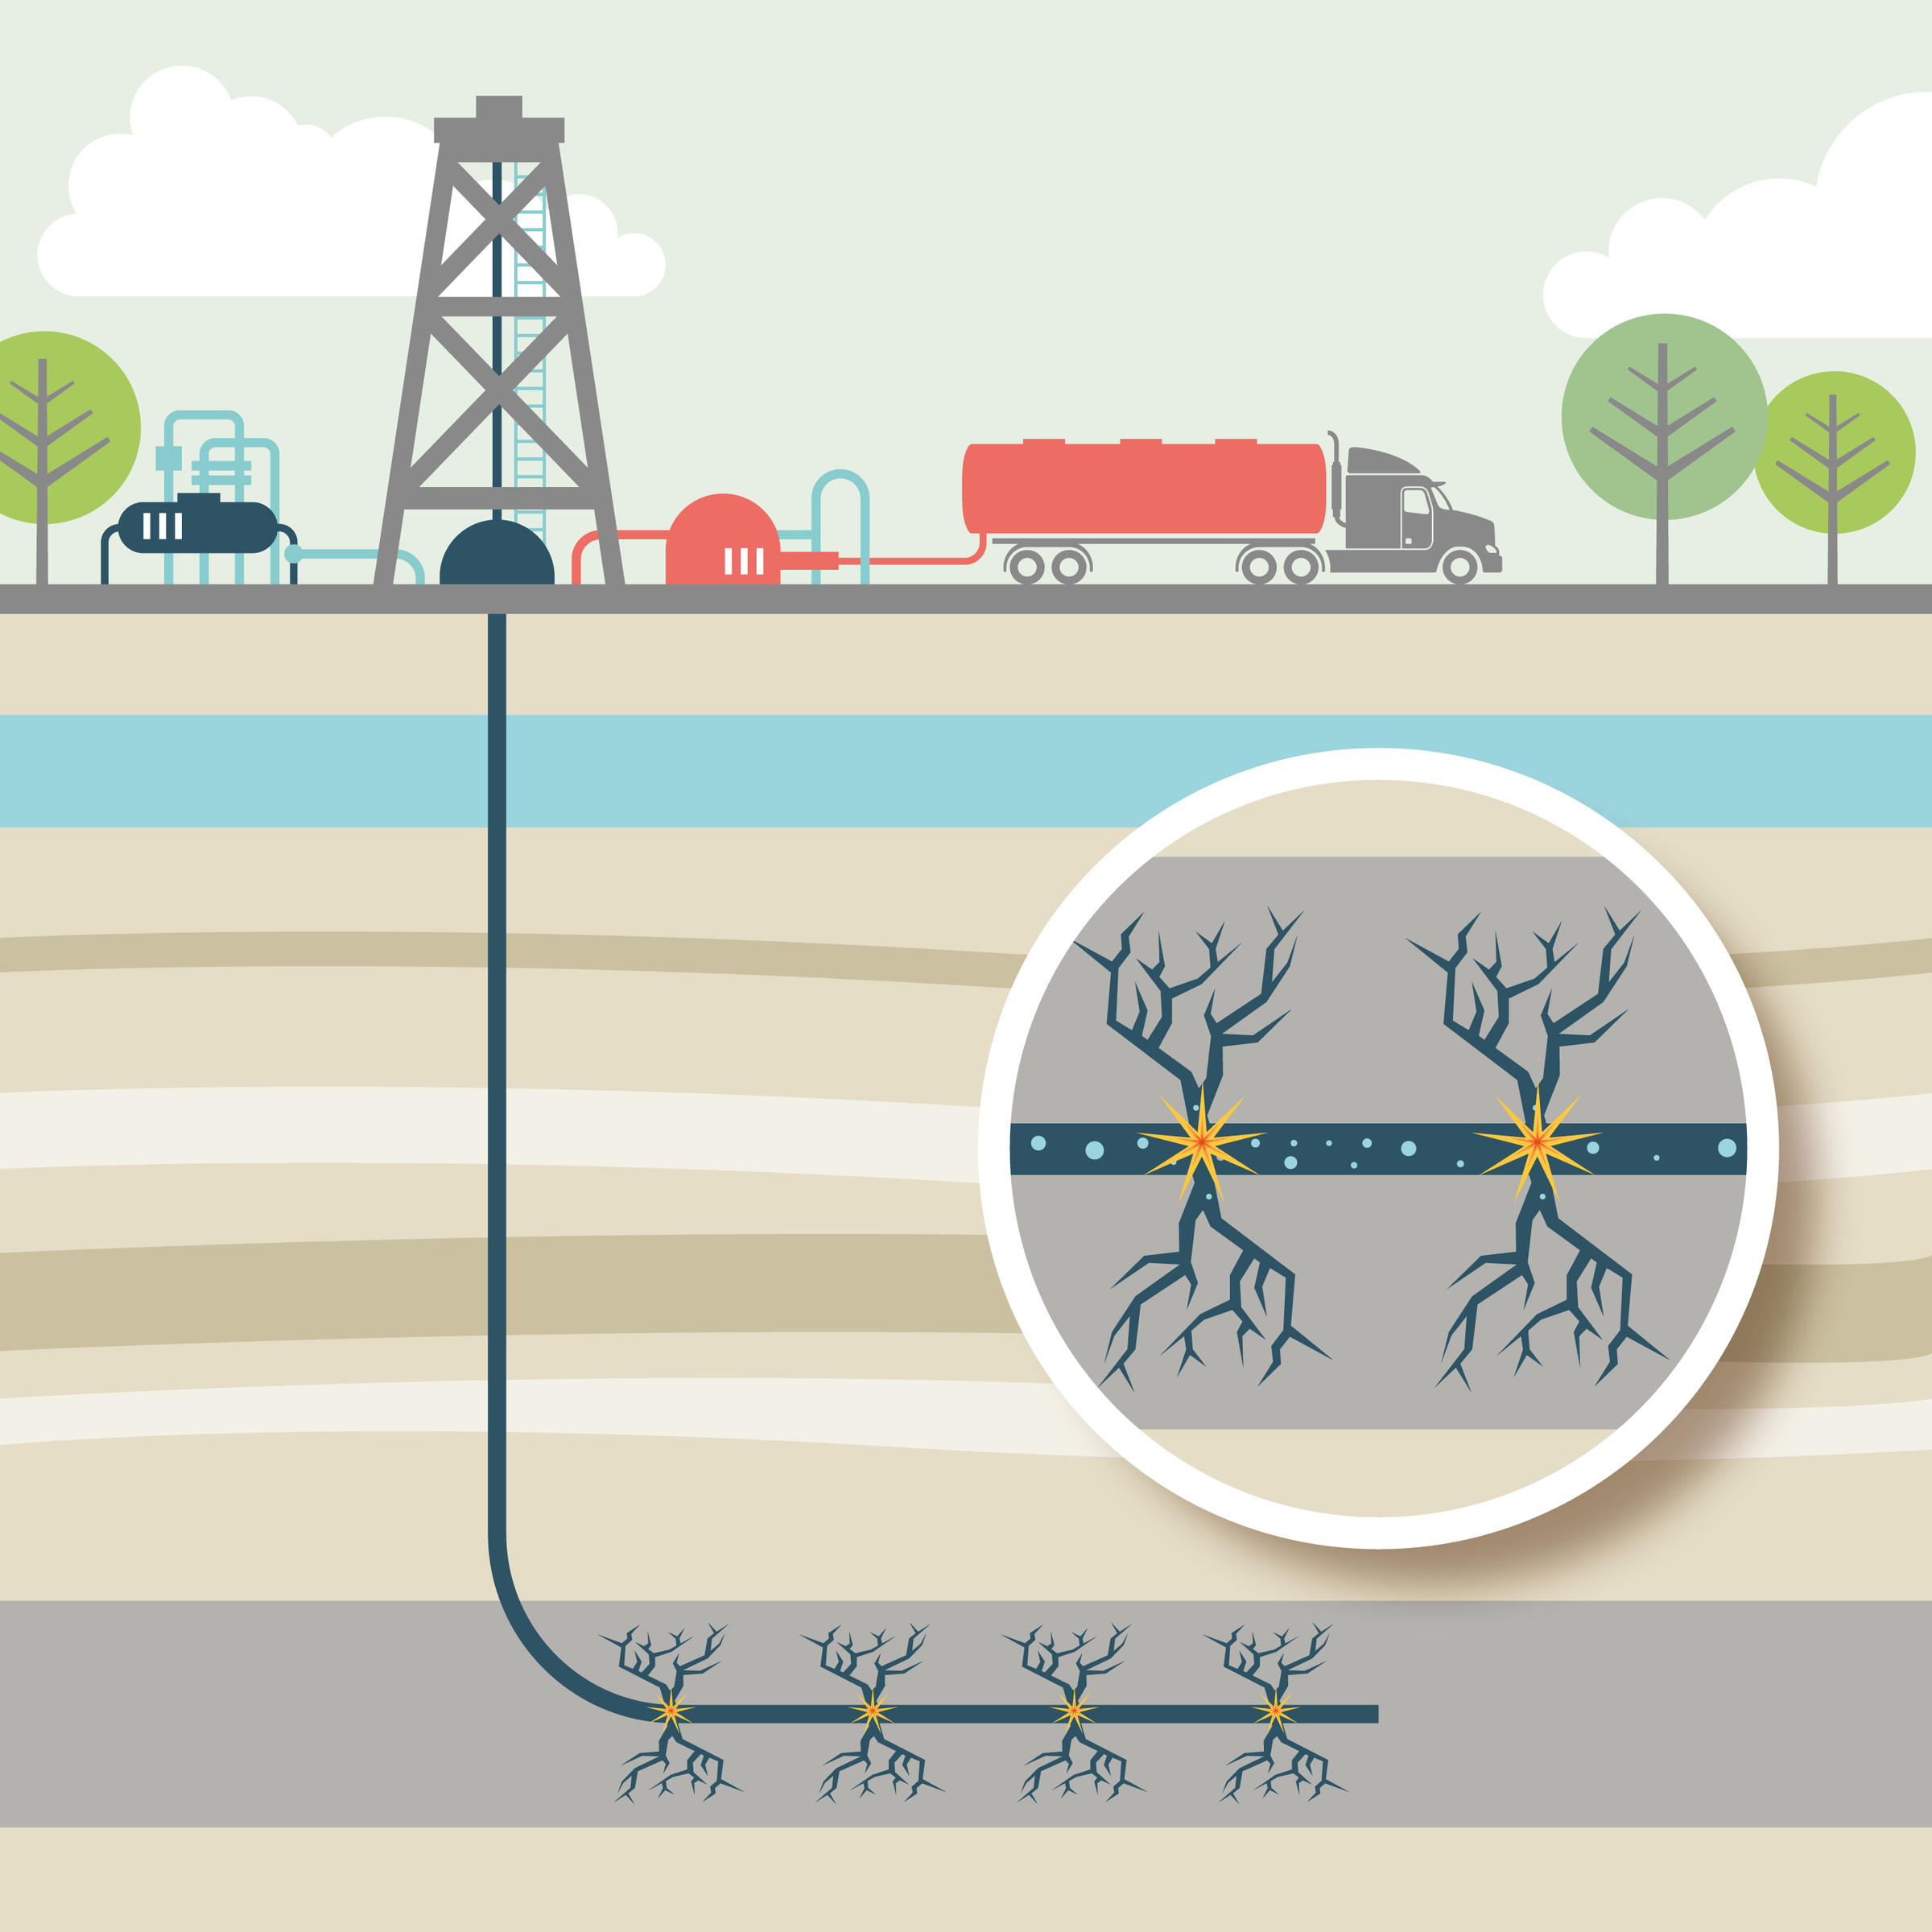 fracking-in-michigan-orig-stock-2012-11-28.jpg